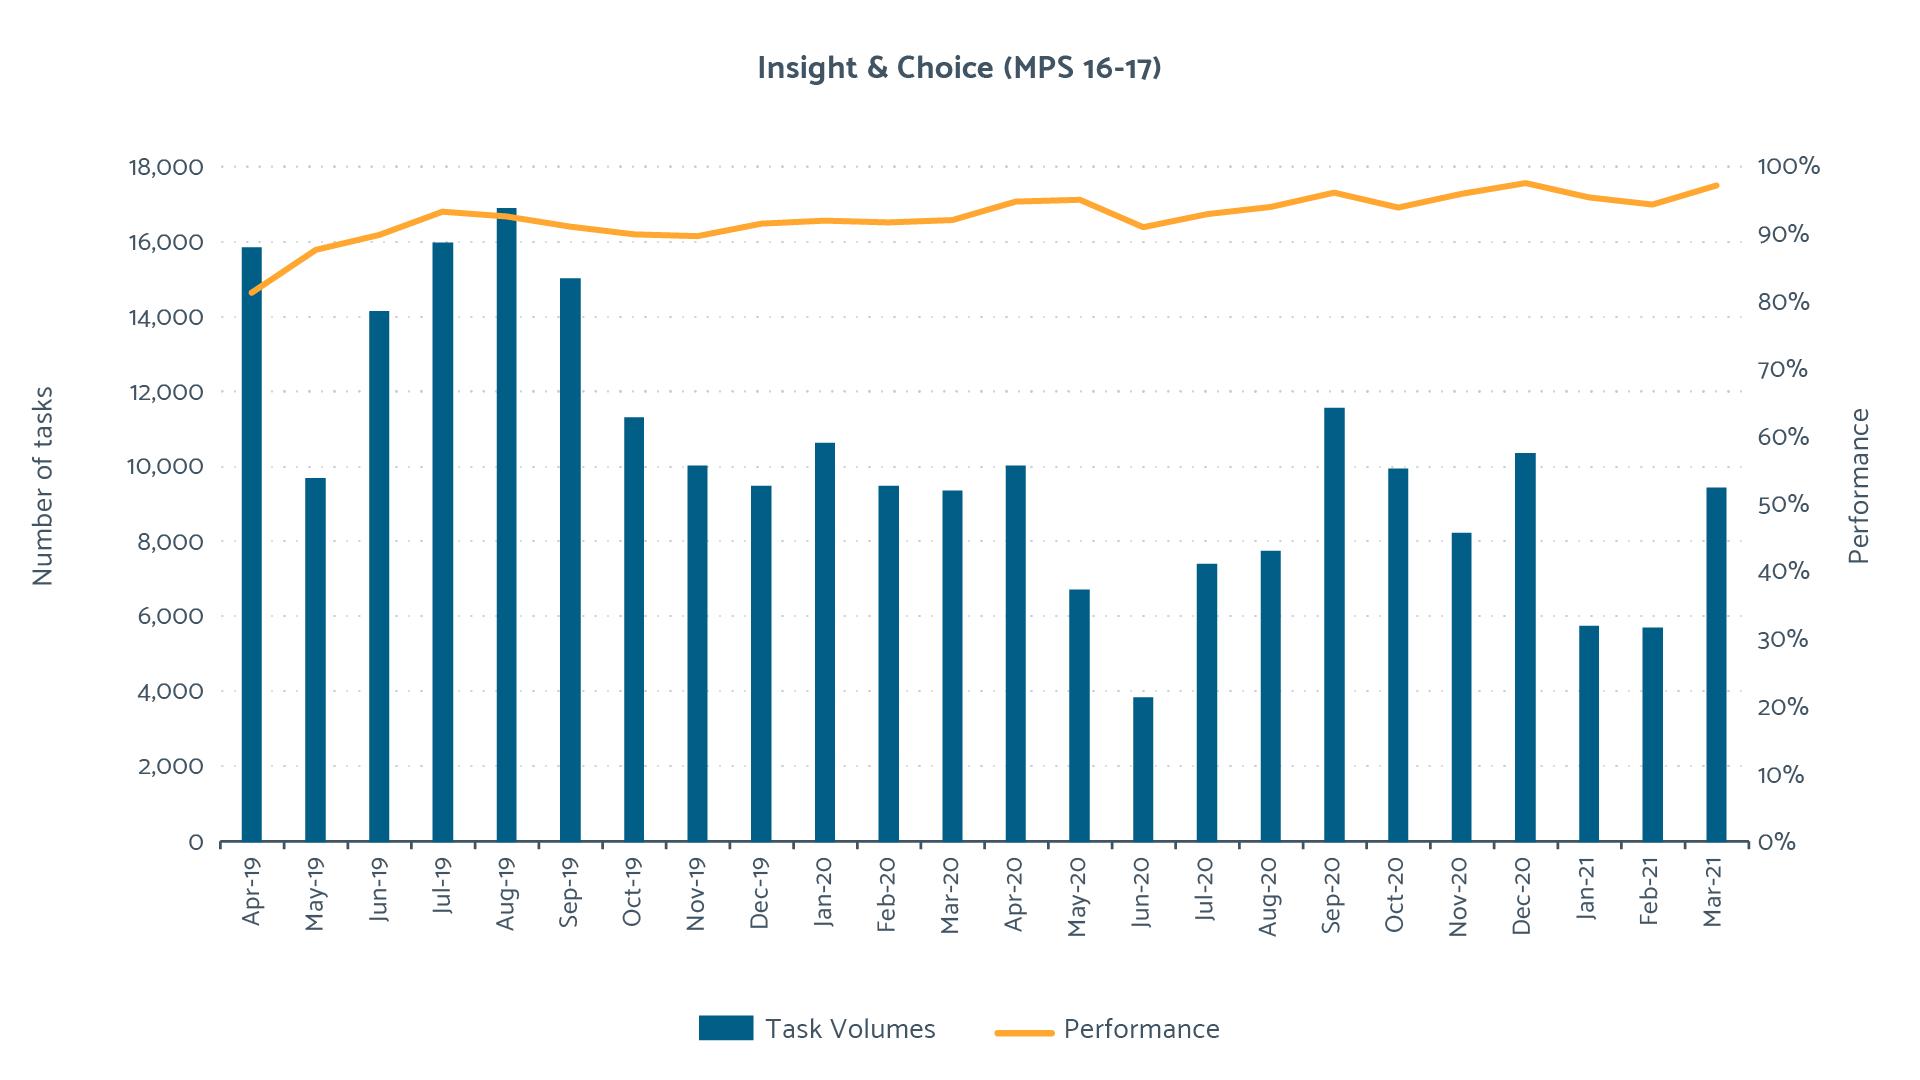 2020/21 Customer Choice Performance